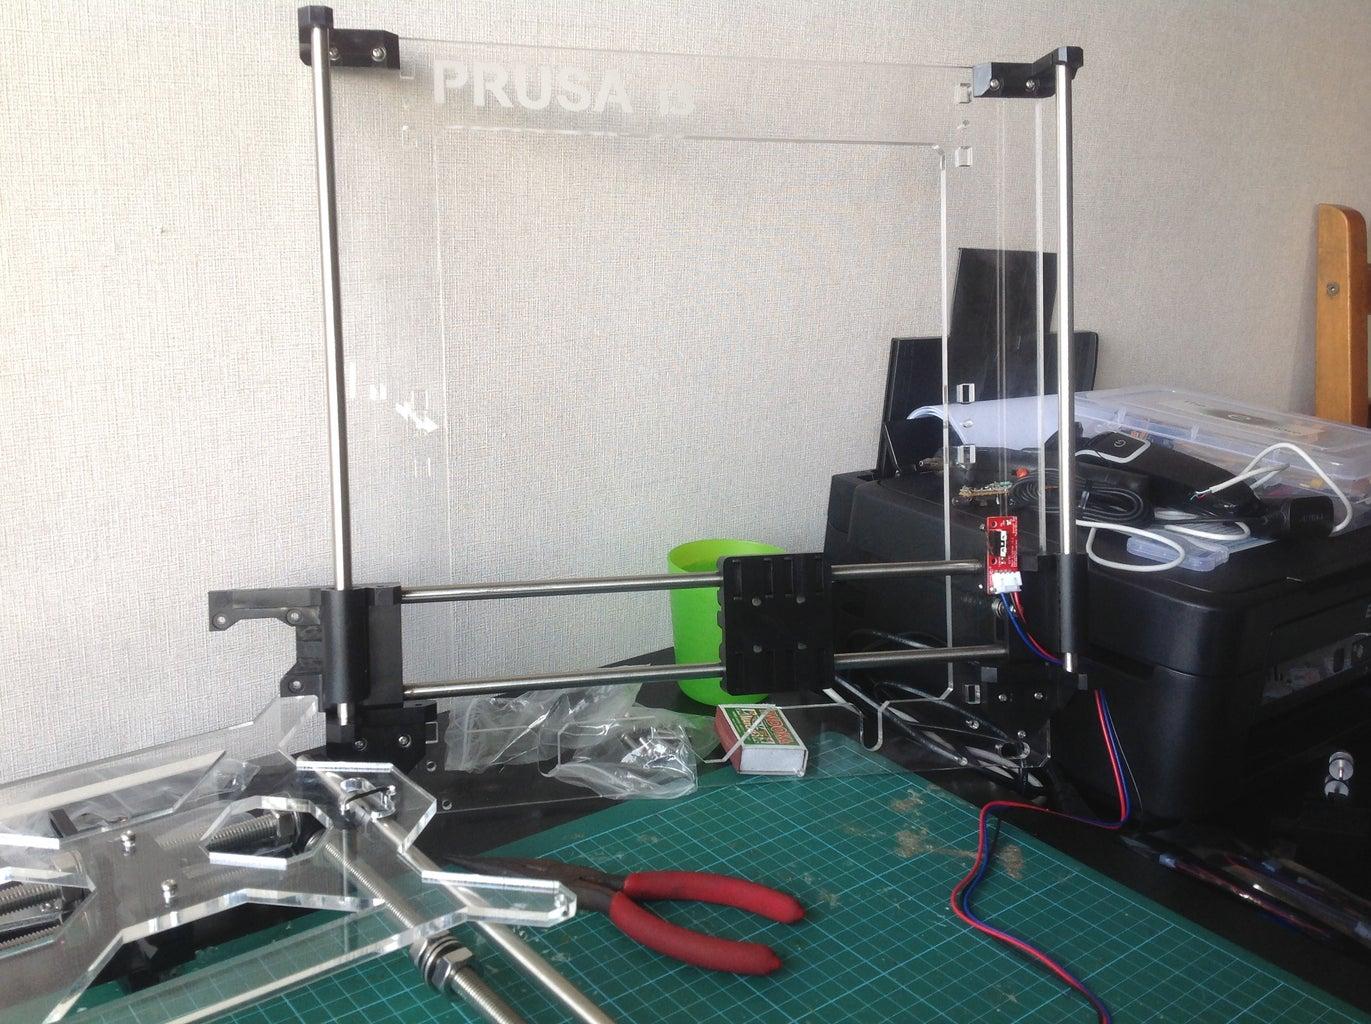 Building the Printer